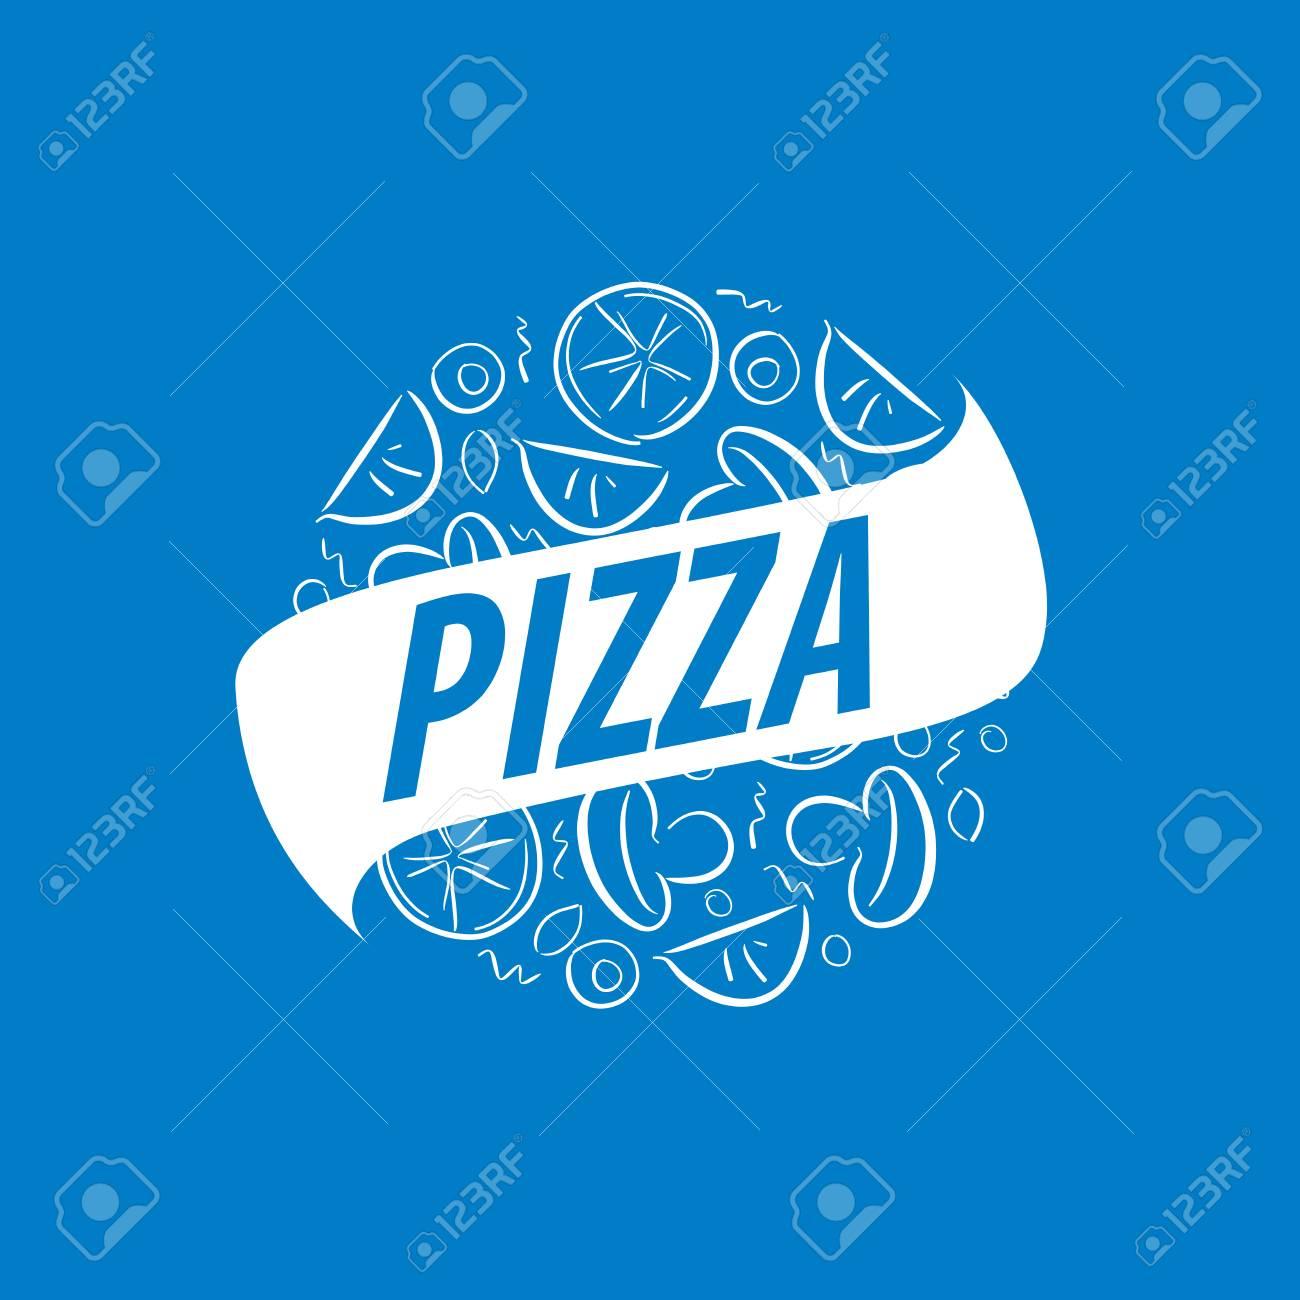 Pizza Vector Logo Royalty Free Cliparts Vectors And Stock